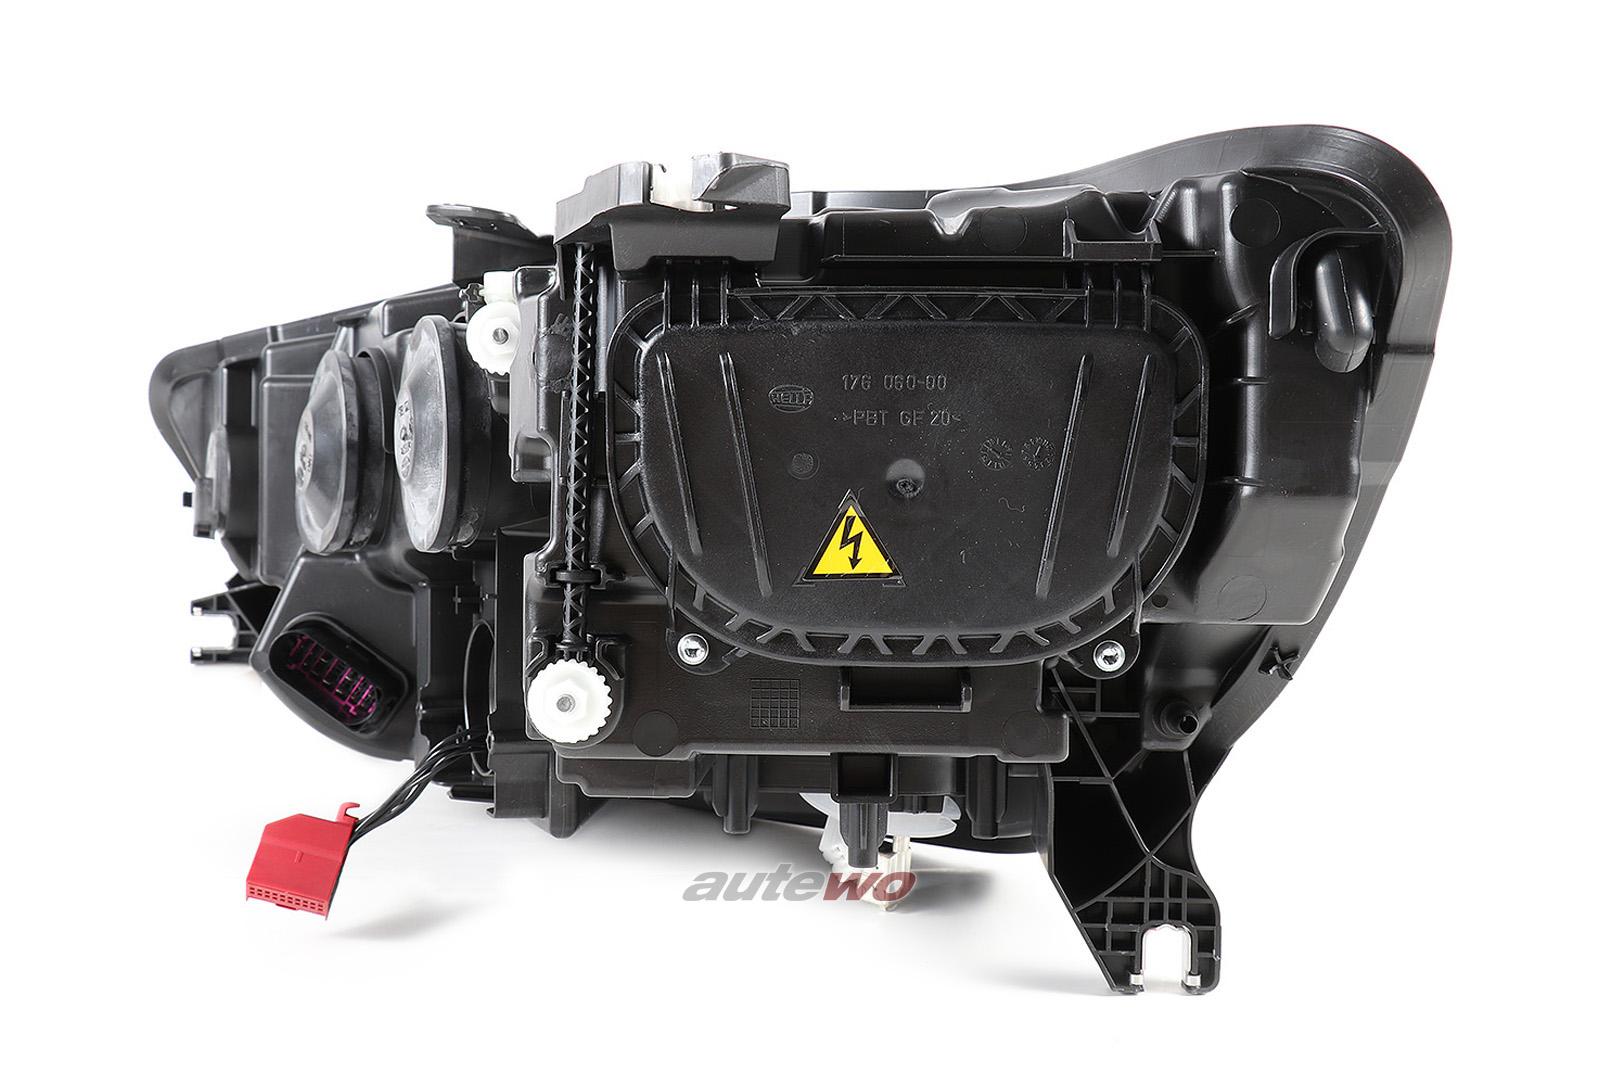 4G0941044B NEU&ORIGINAL Audi A6 4G Bi-Xenon Scheinwerfer US-Version Rechts